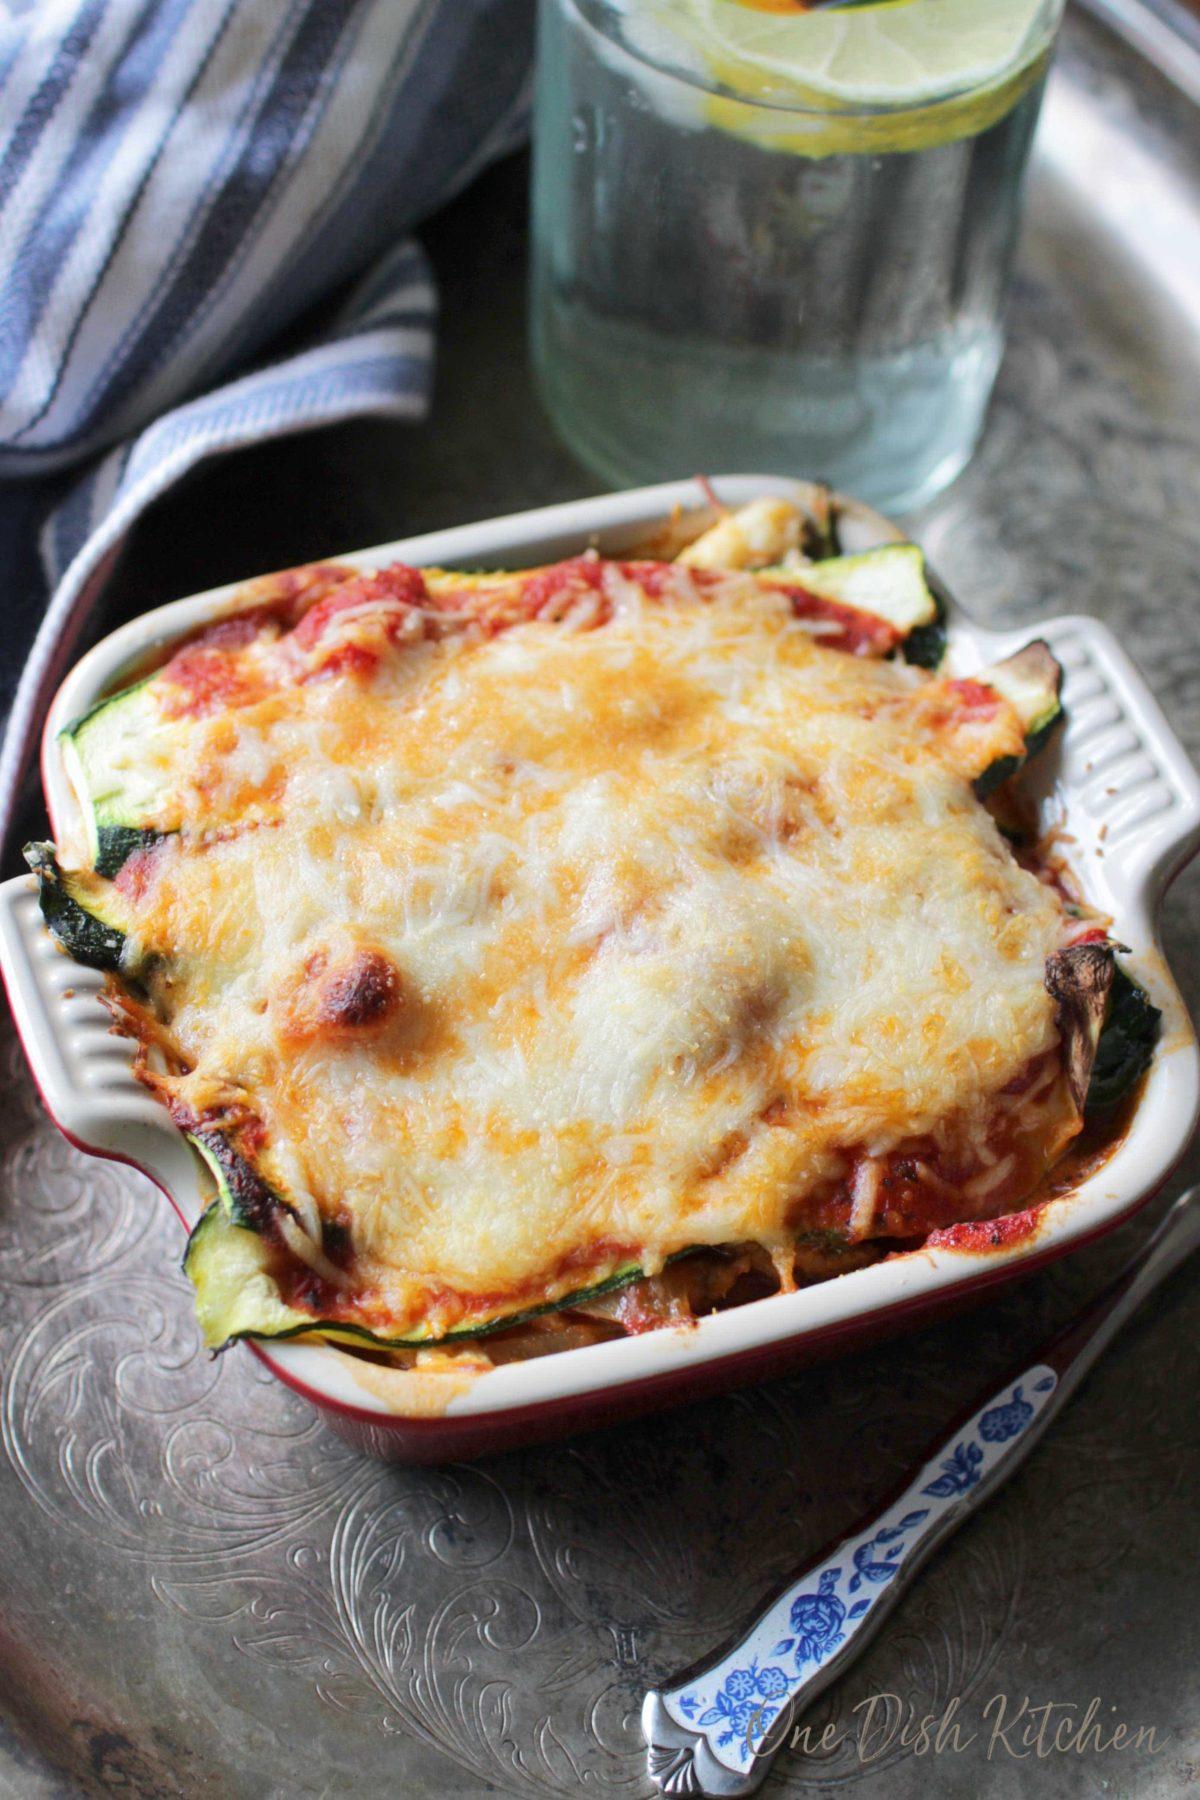 A mini zucchini lasagna in a small baking dish